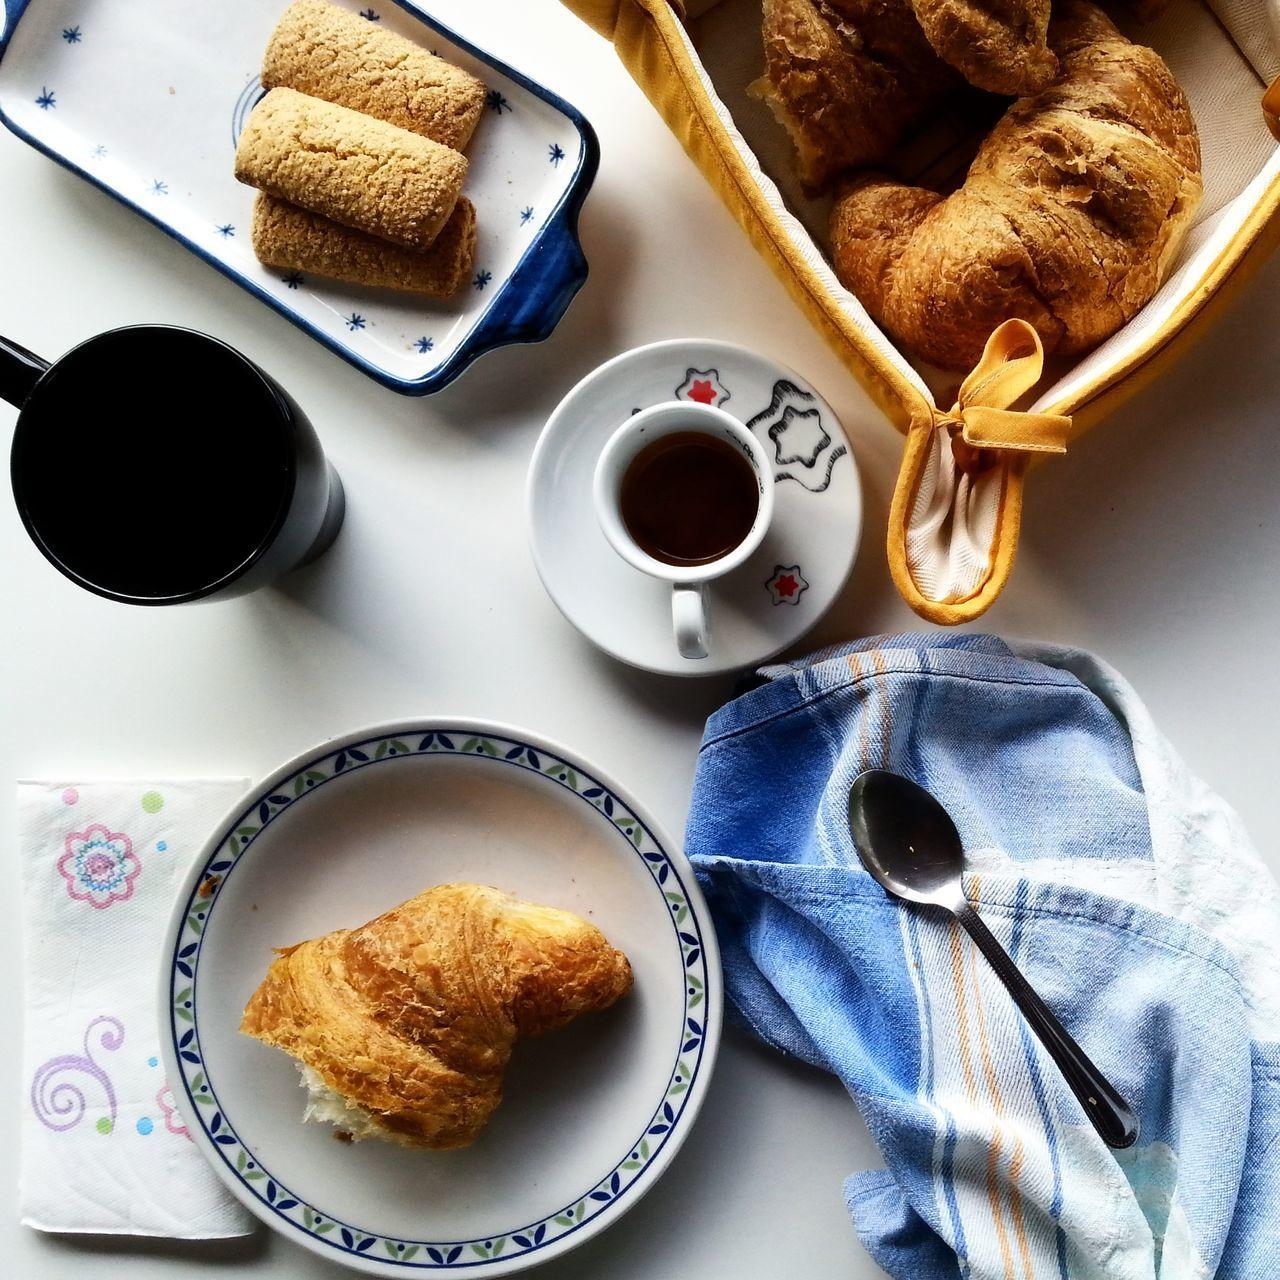 Beautiful stock photos of breakfast, Baked Pastry Item, Breakfast, Coffee, Coffee Cup